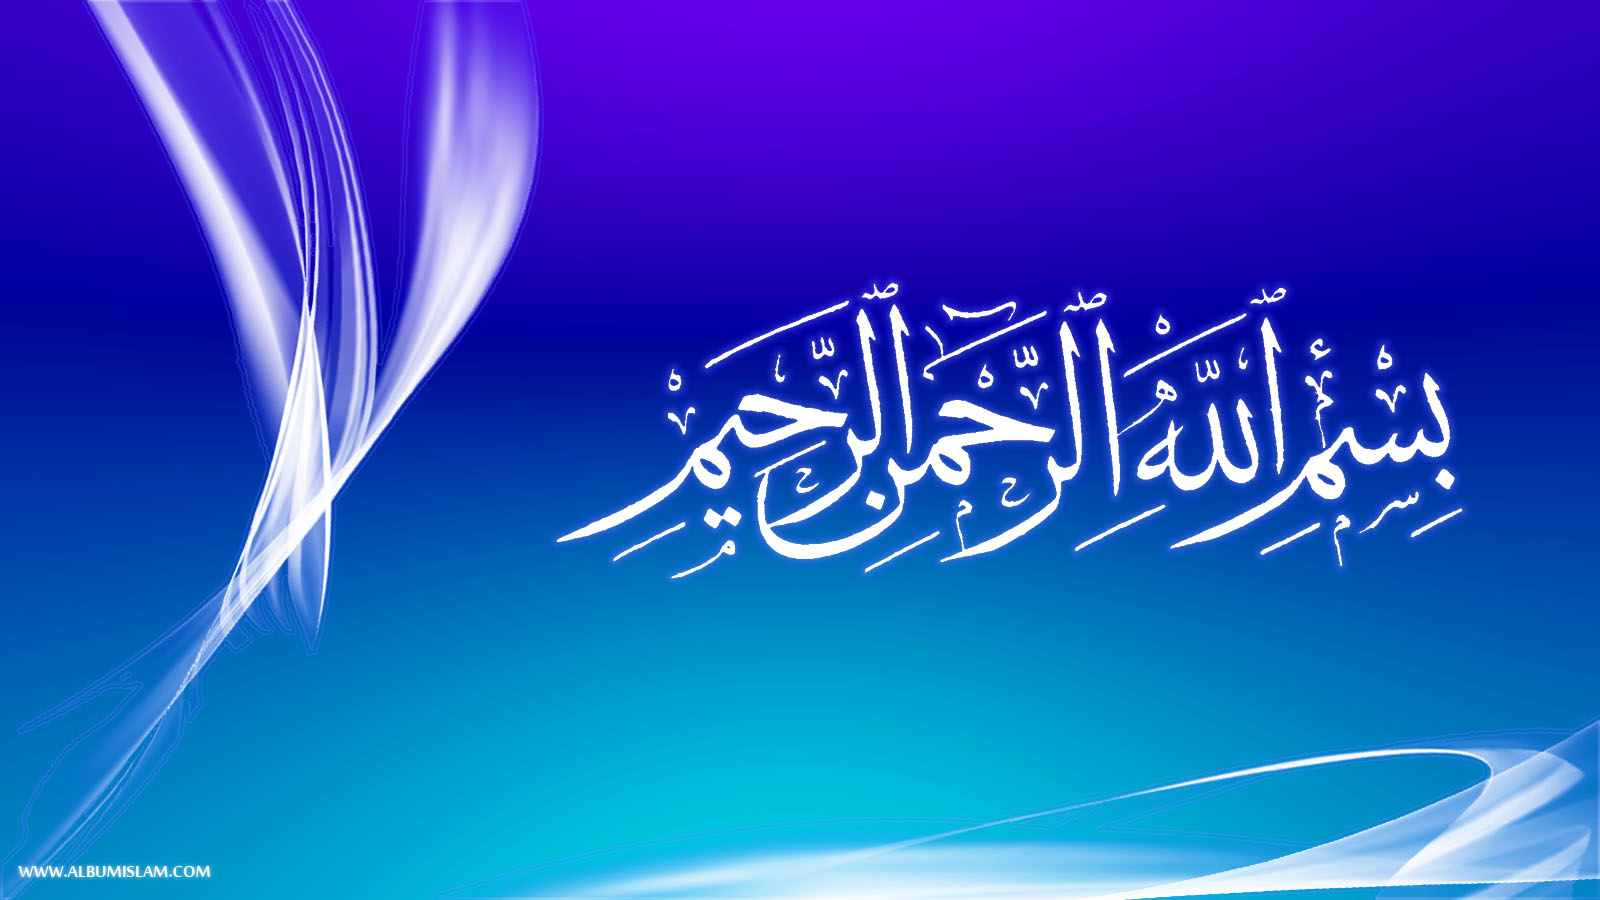 beautiful hd bismillah image